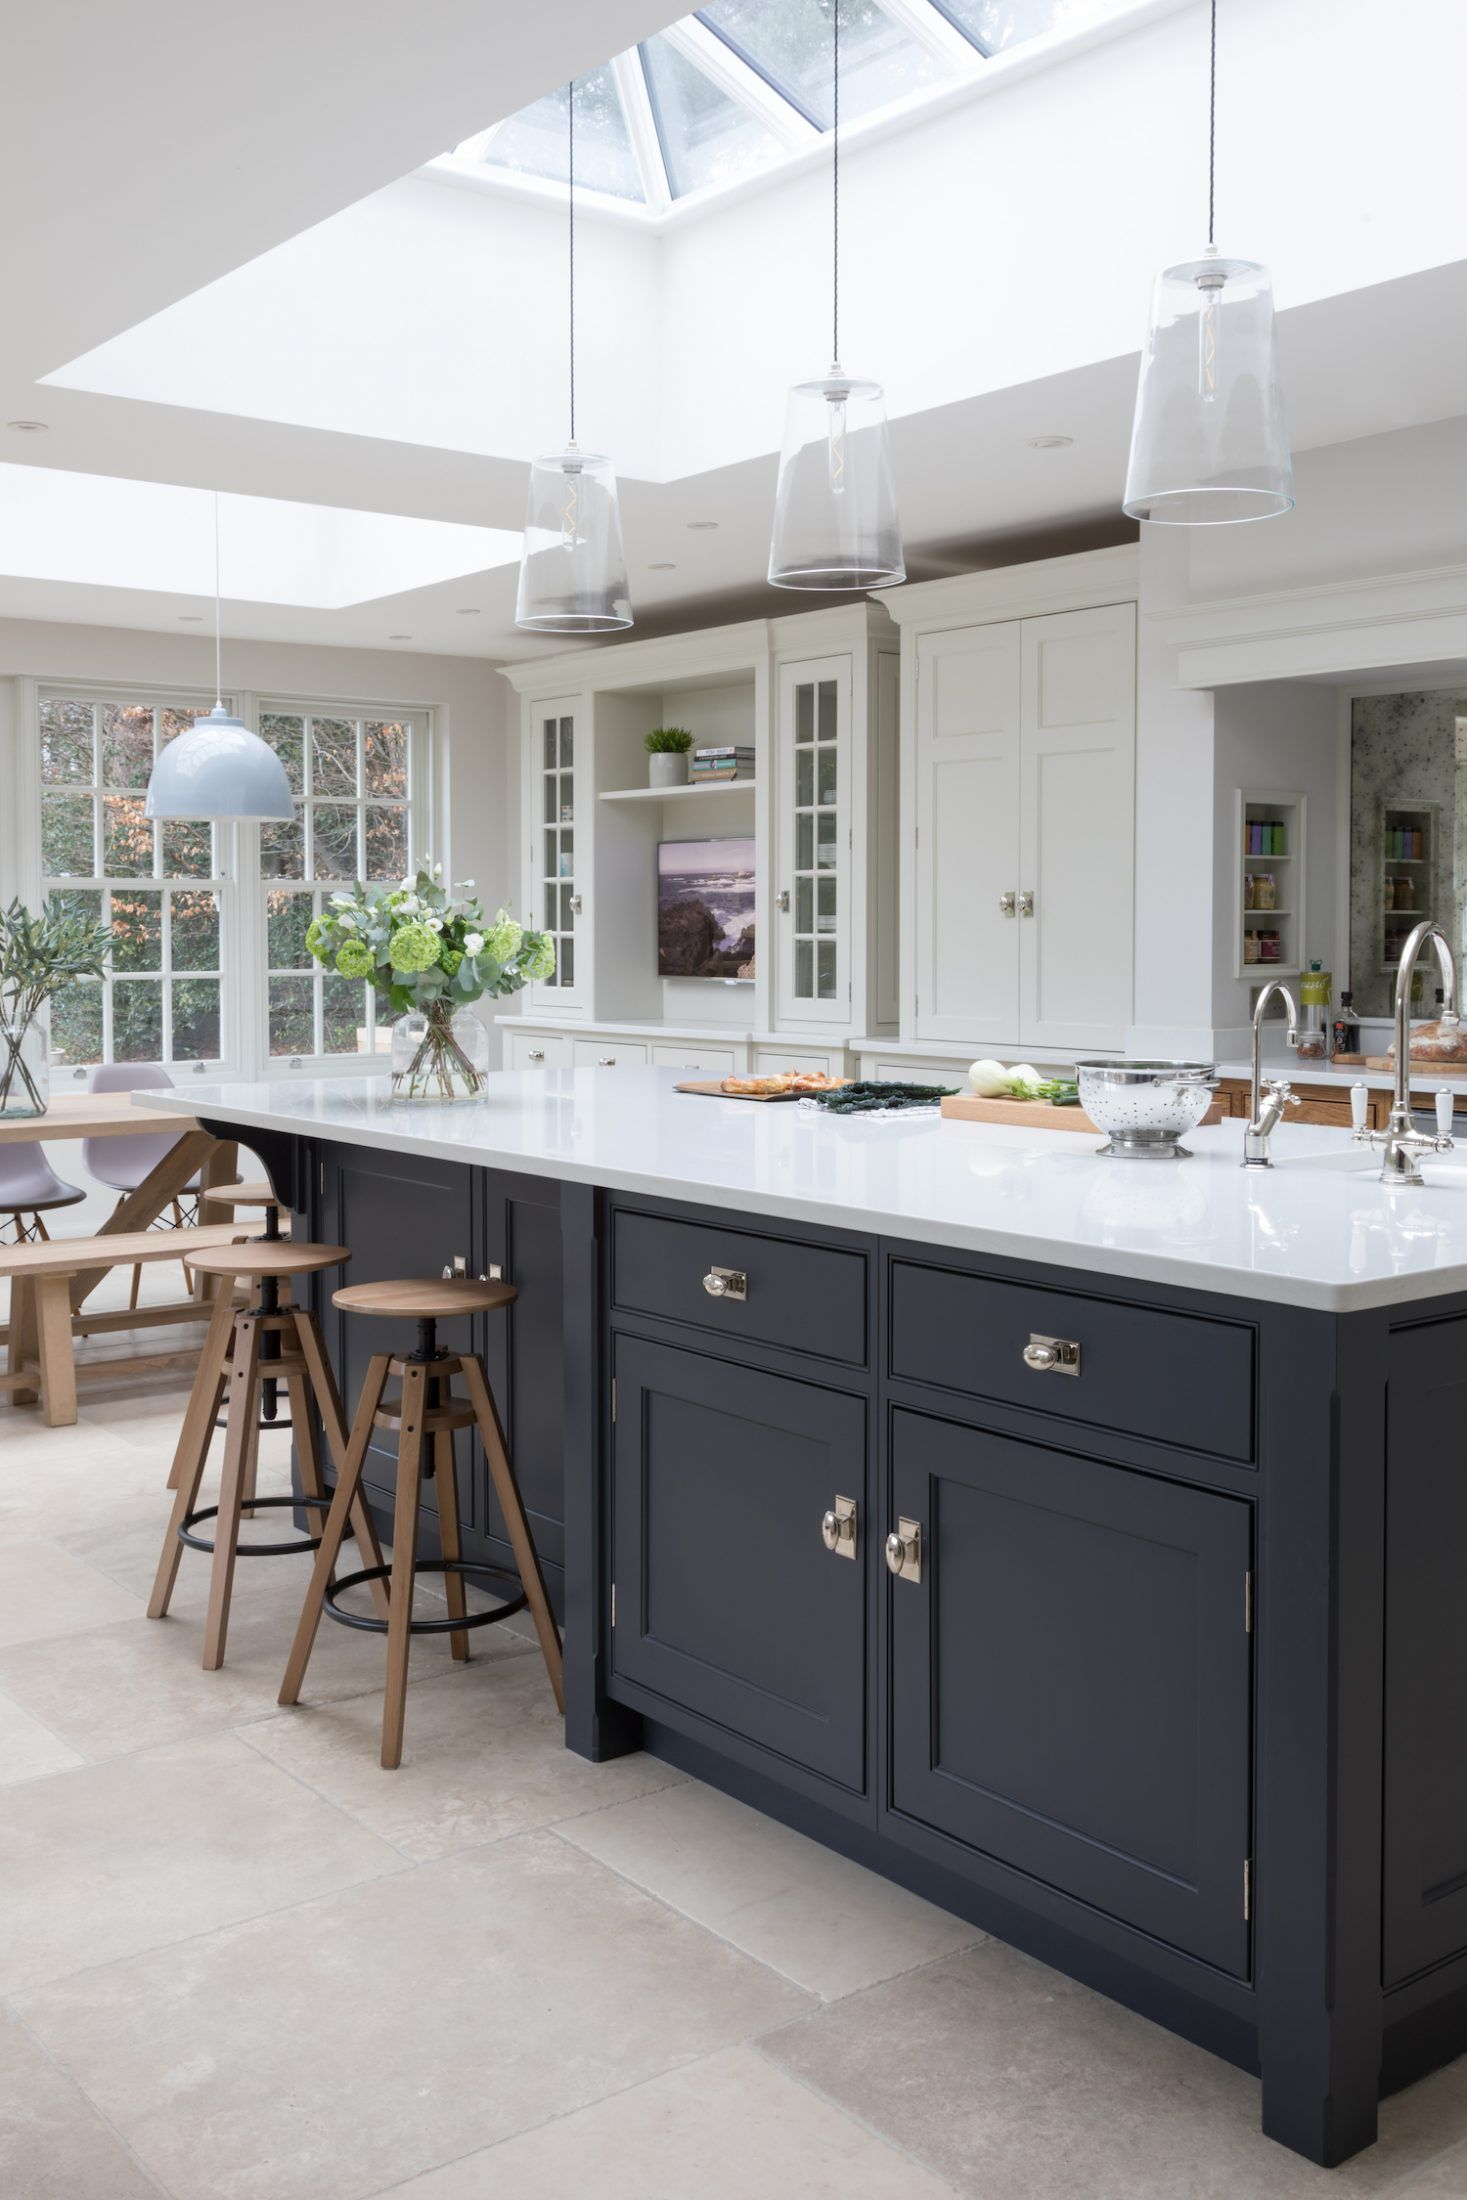 Interior Design Open Kitchen: Open Plan Family Kitchen, Cobham